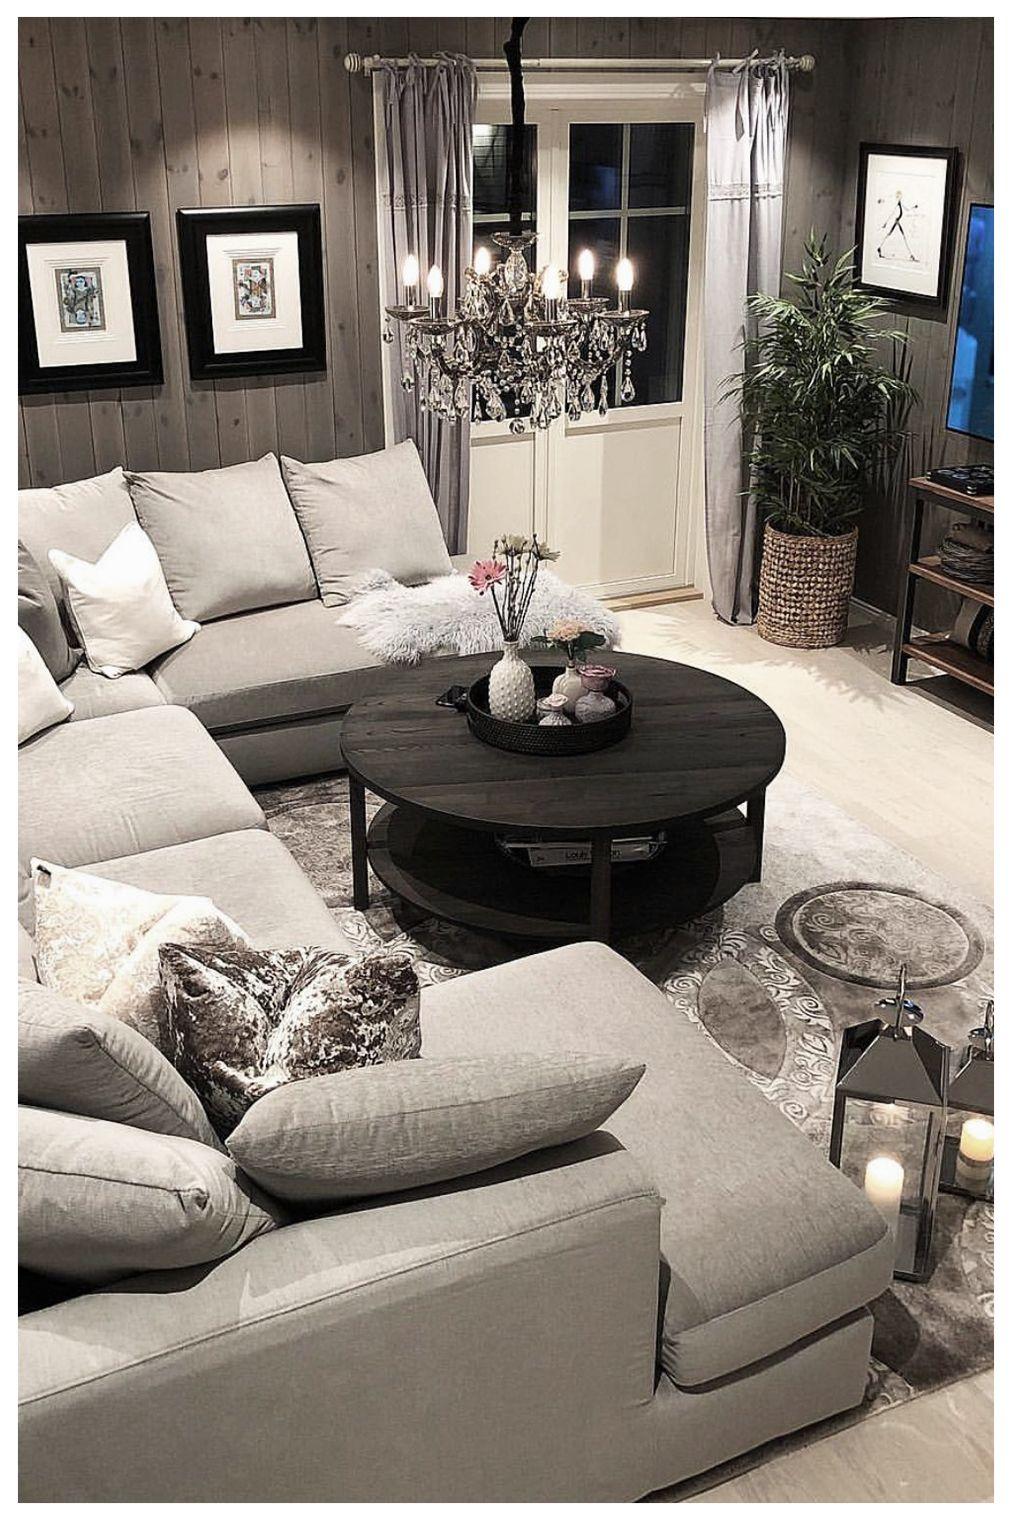 20 Astonishing Living Room Remodel Ideas 2020 L Tips Trends Cozy Living Room Design Living Room Decor Cozy Small Apartment Living Room